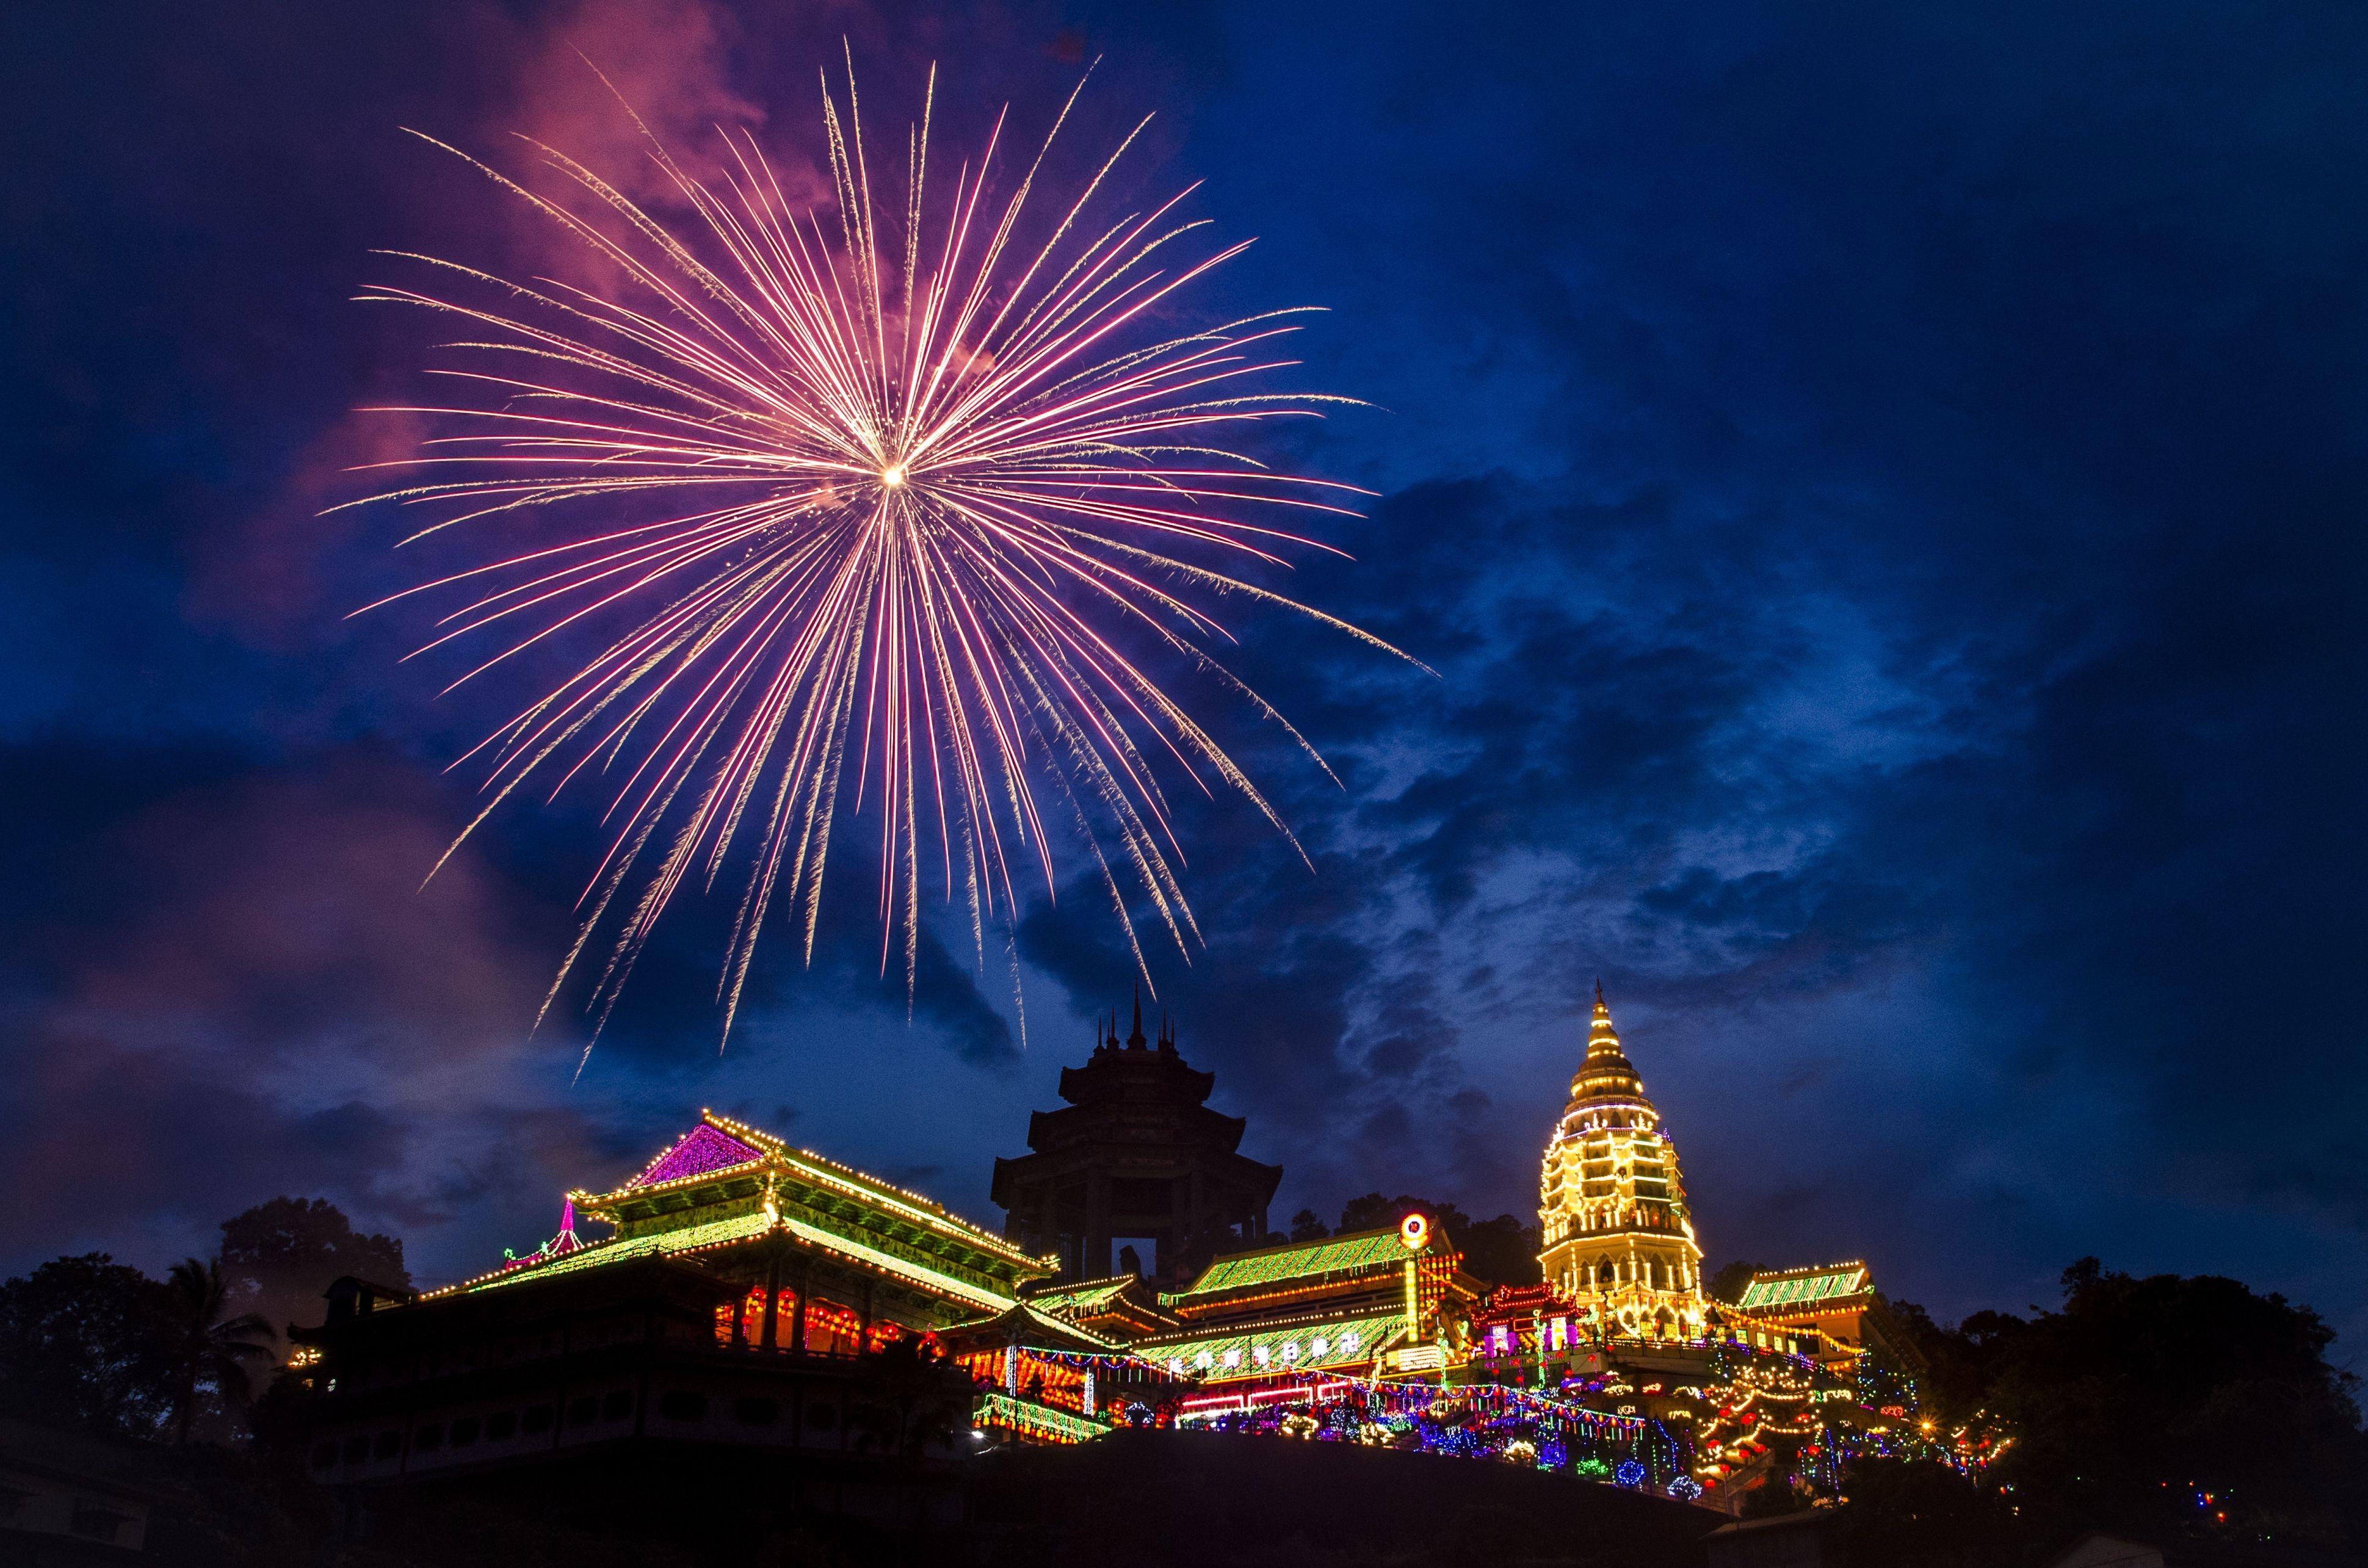 2019 March Calendar Malaysia Más Recientemente Liberado Buddhist Holidays 2018–2019 Illustrated Calendar Of 2019 March Calendar Malaysia Más Caliente Cute Printable Calendar 2019